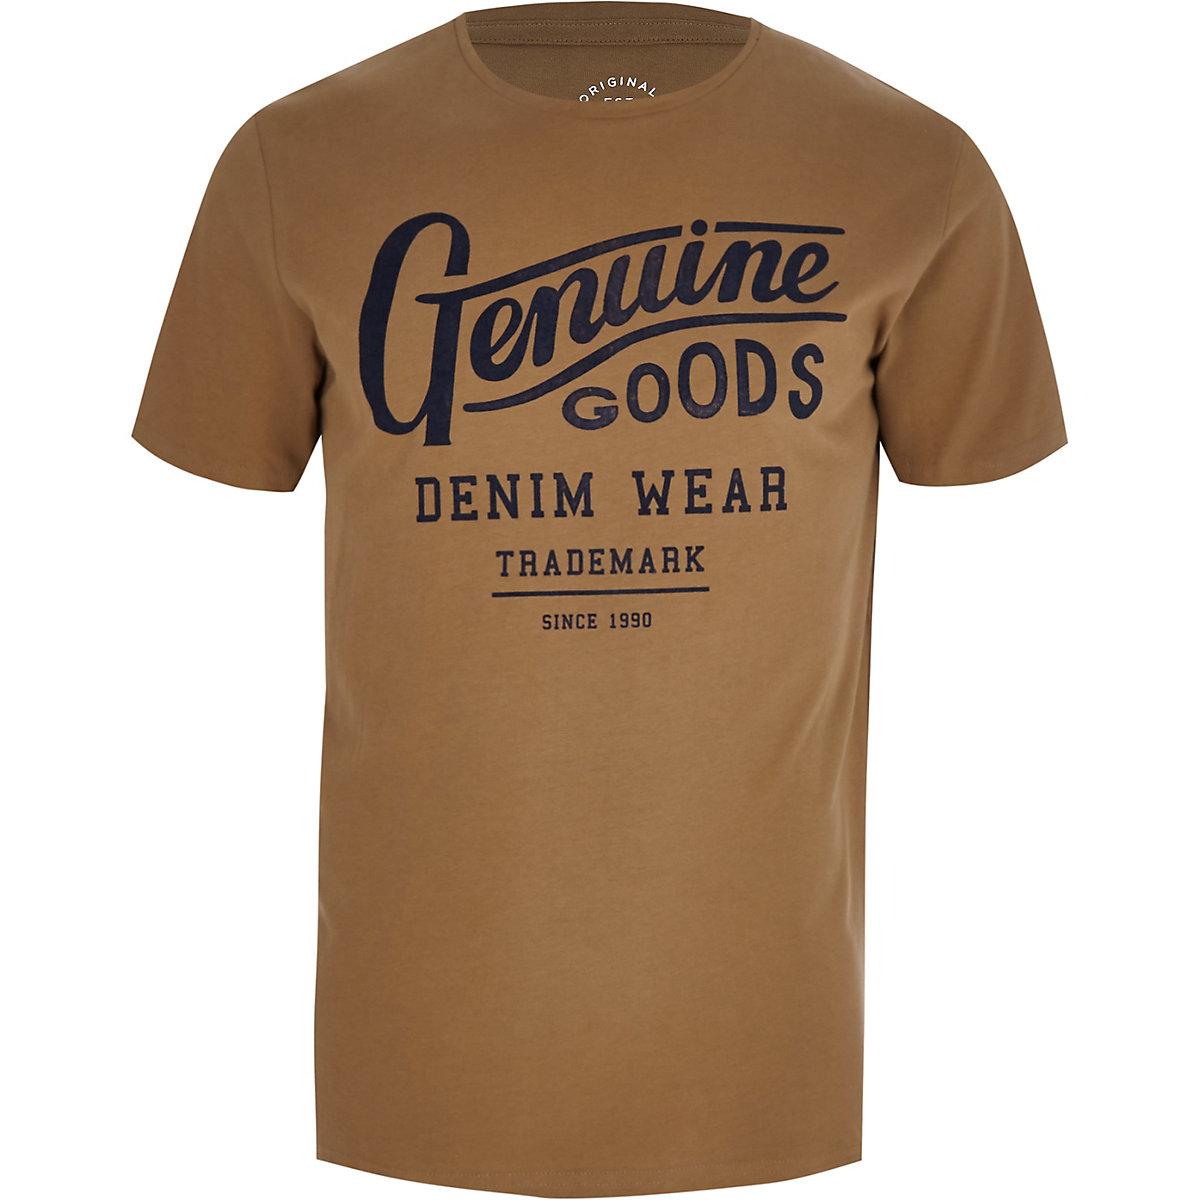 Jack & Jones ecru 'genuine goods' T-shirt